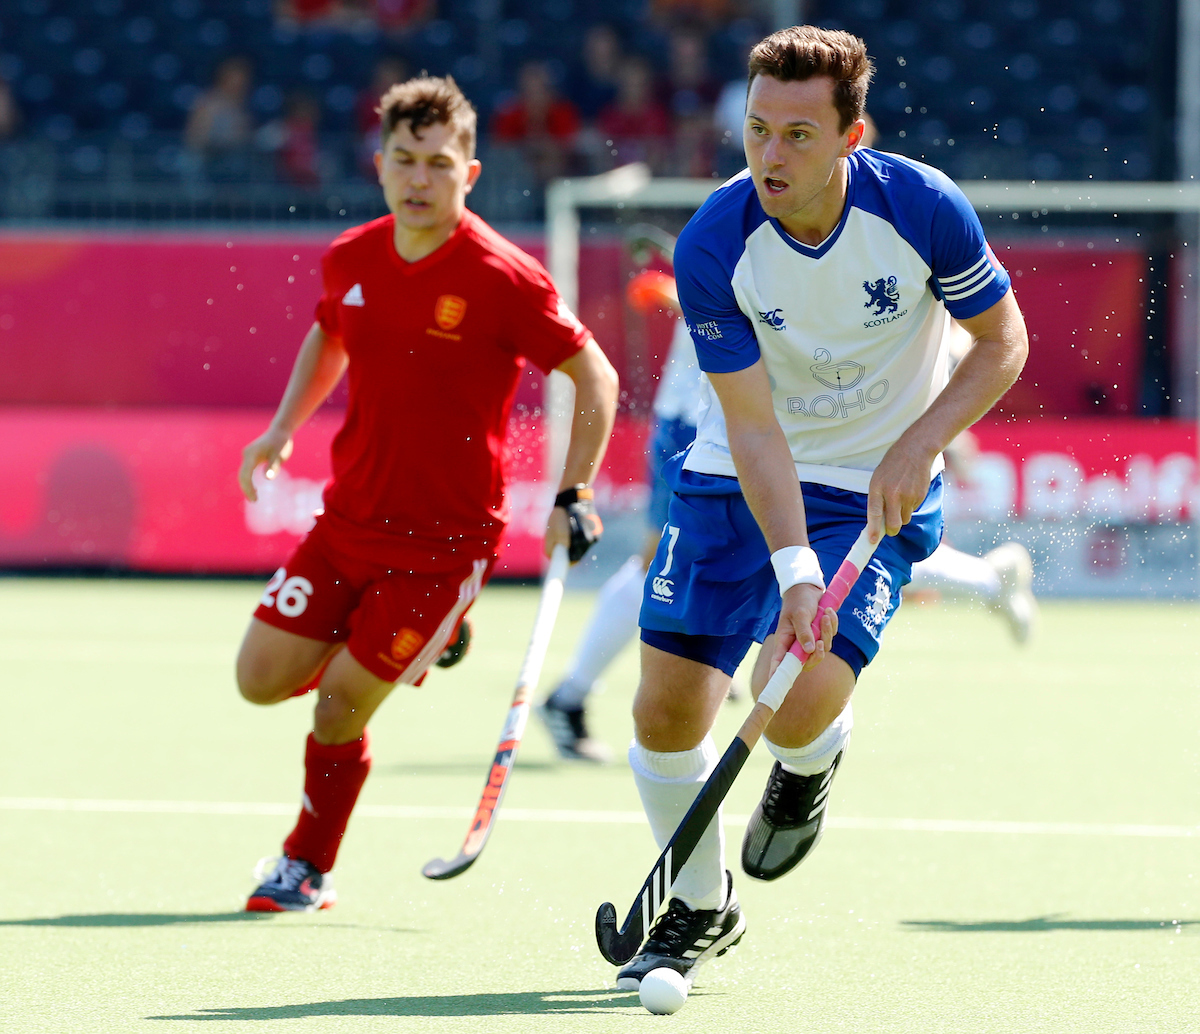 Alan Forsyth - GB Hockey